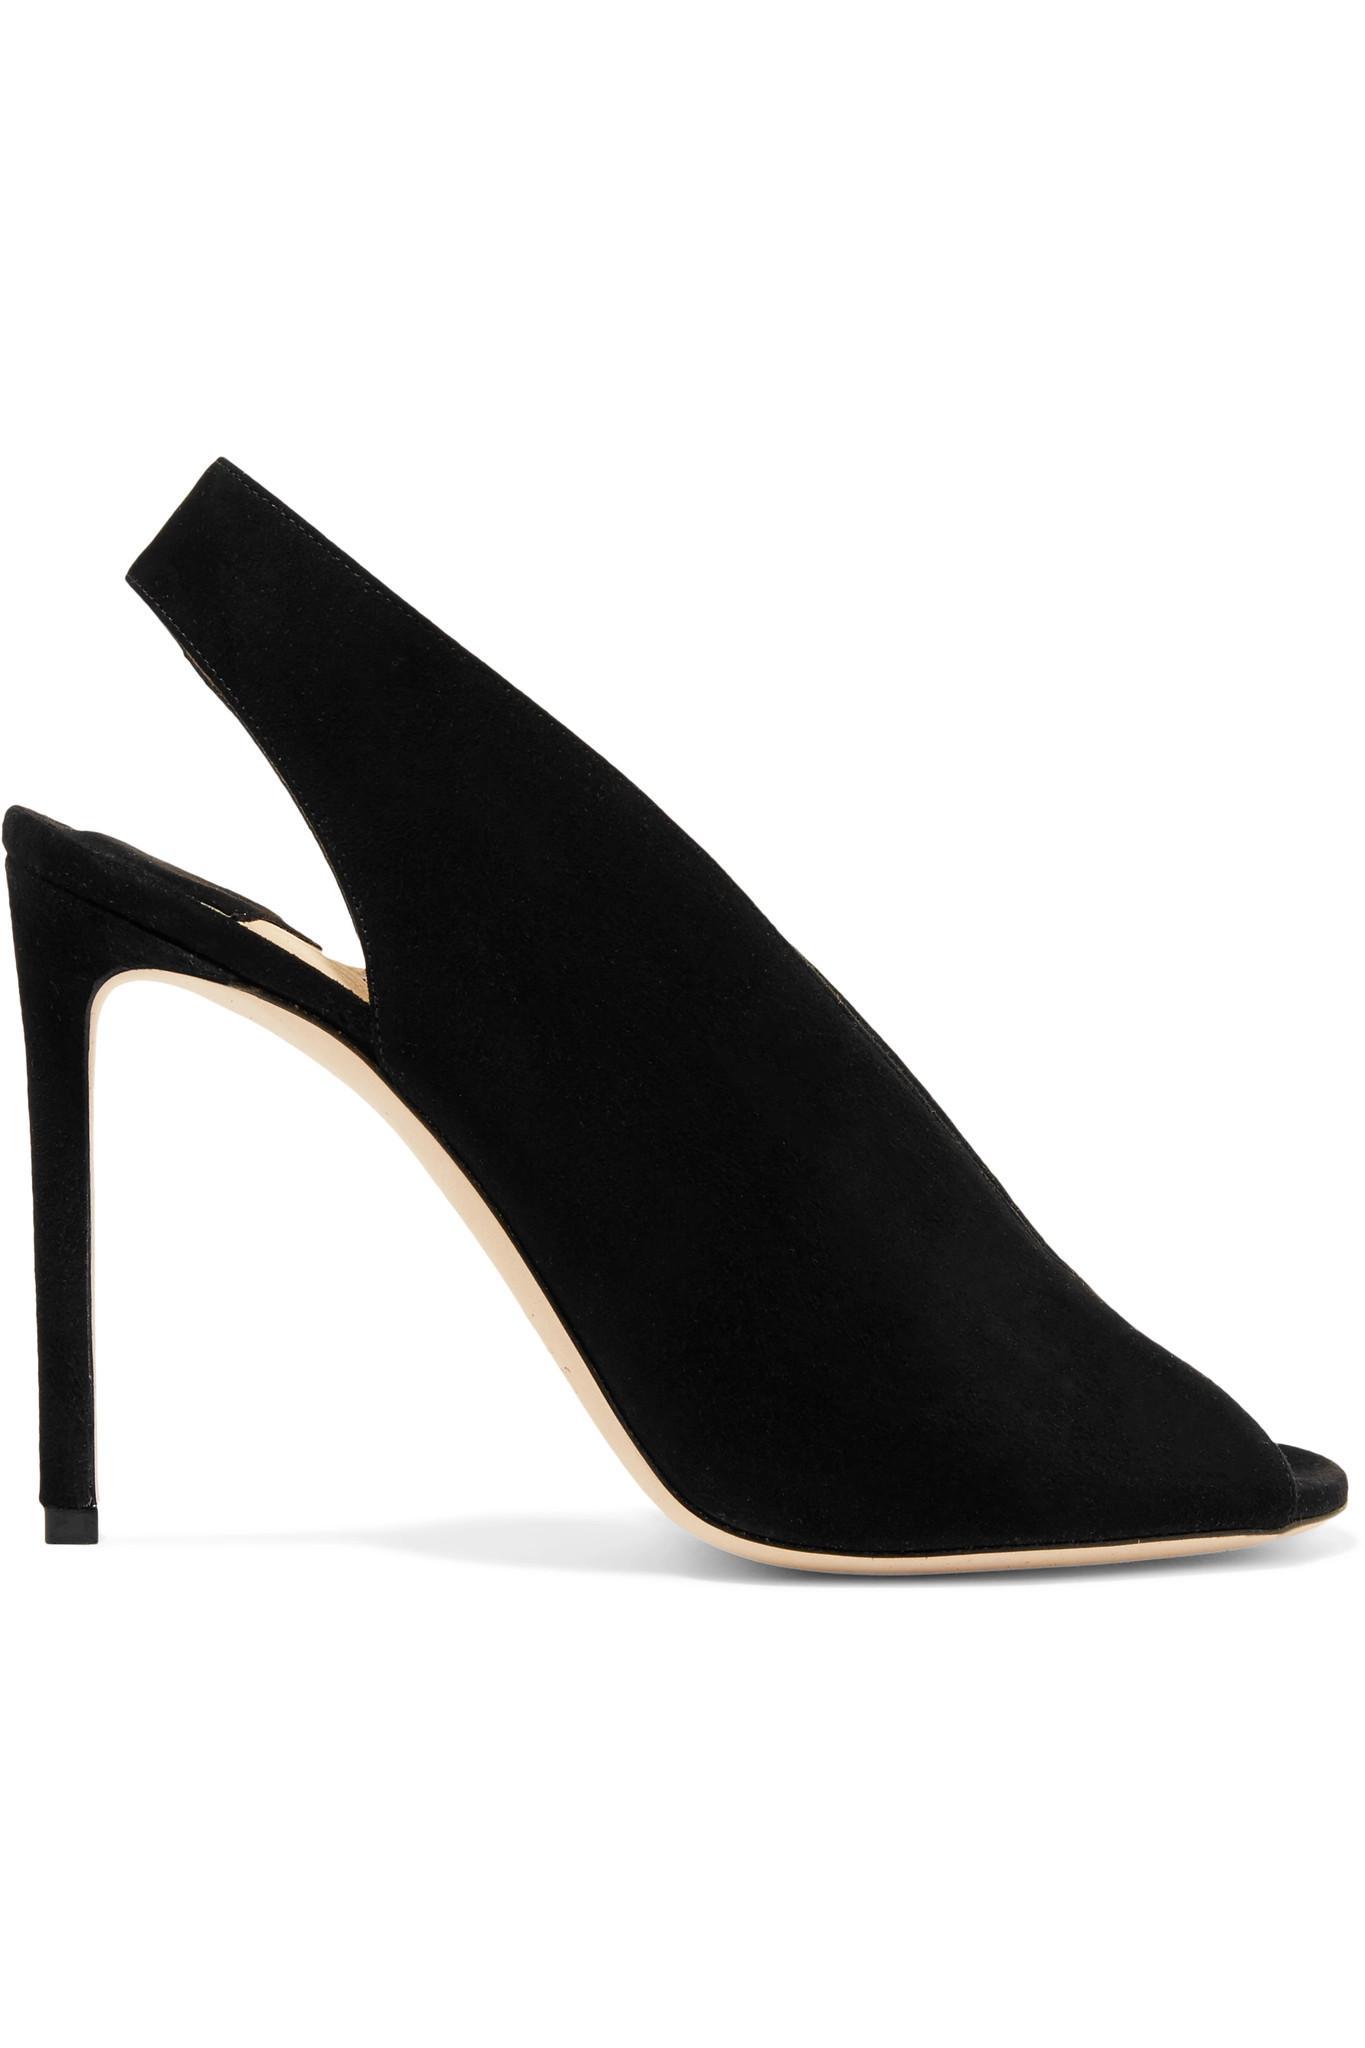 20ac7c468c2 Jimmy Choo. Women s Black Shar 100 Suede Slingback Court Shoes